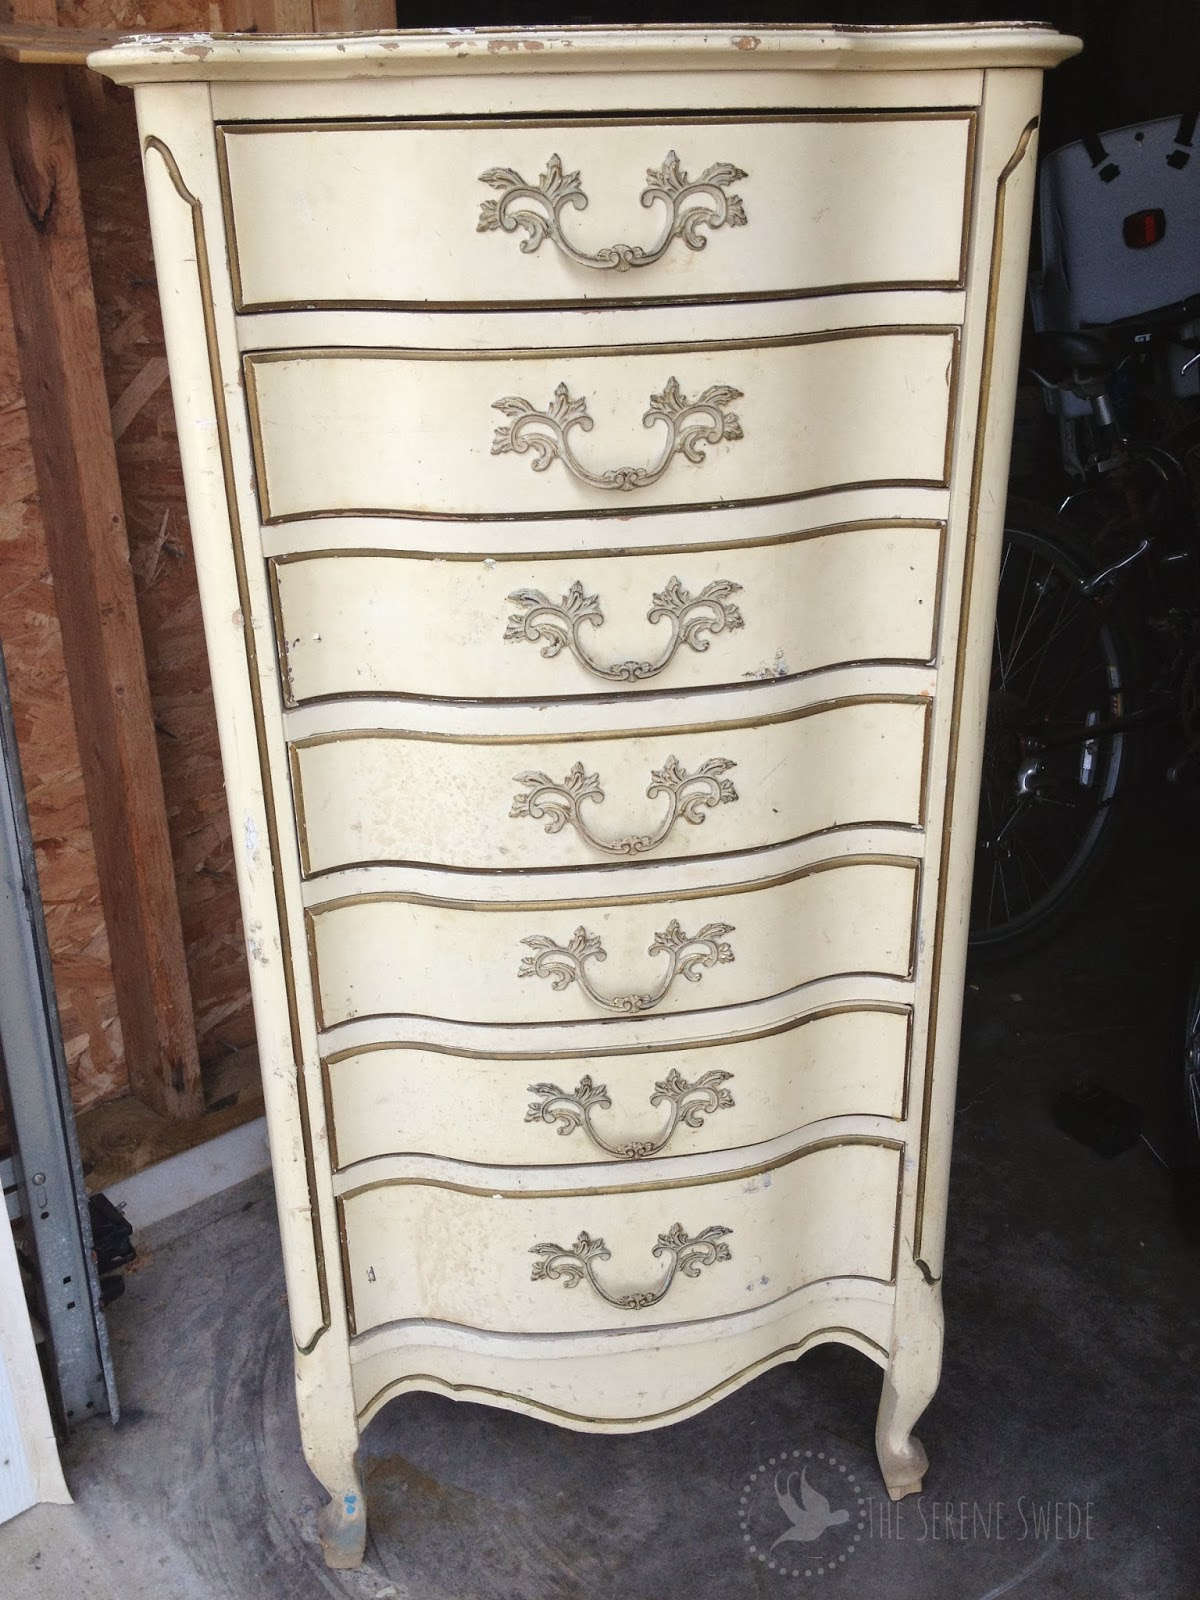 The Serene Swede French Provincial Dresser Fake It Till